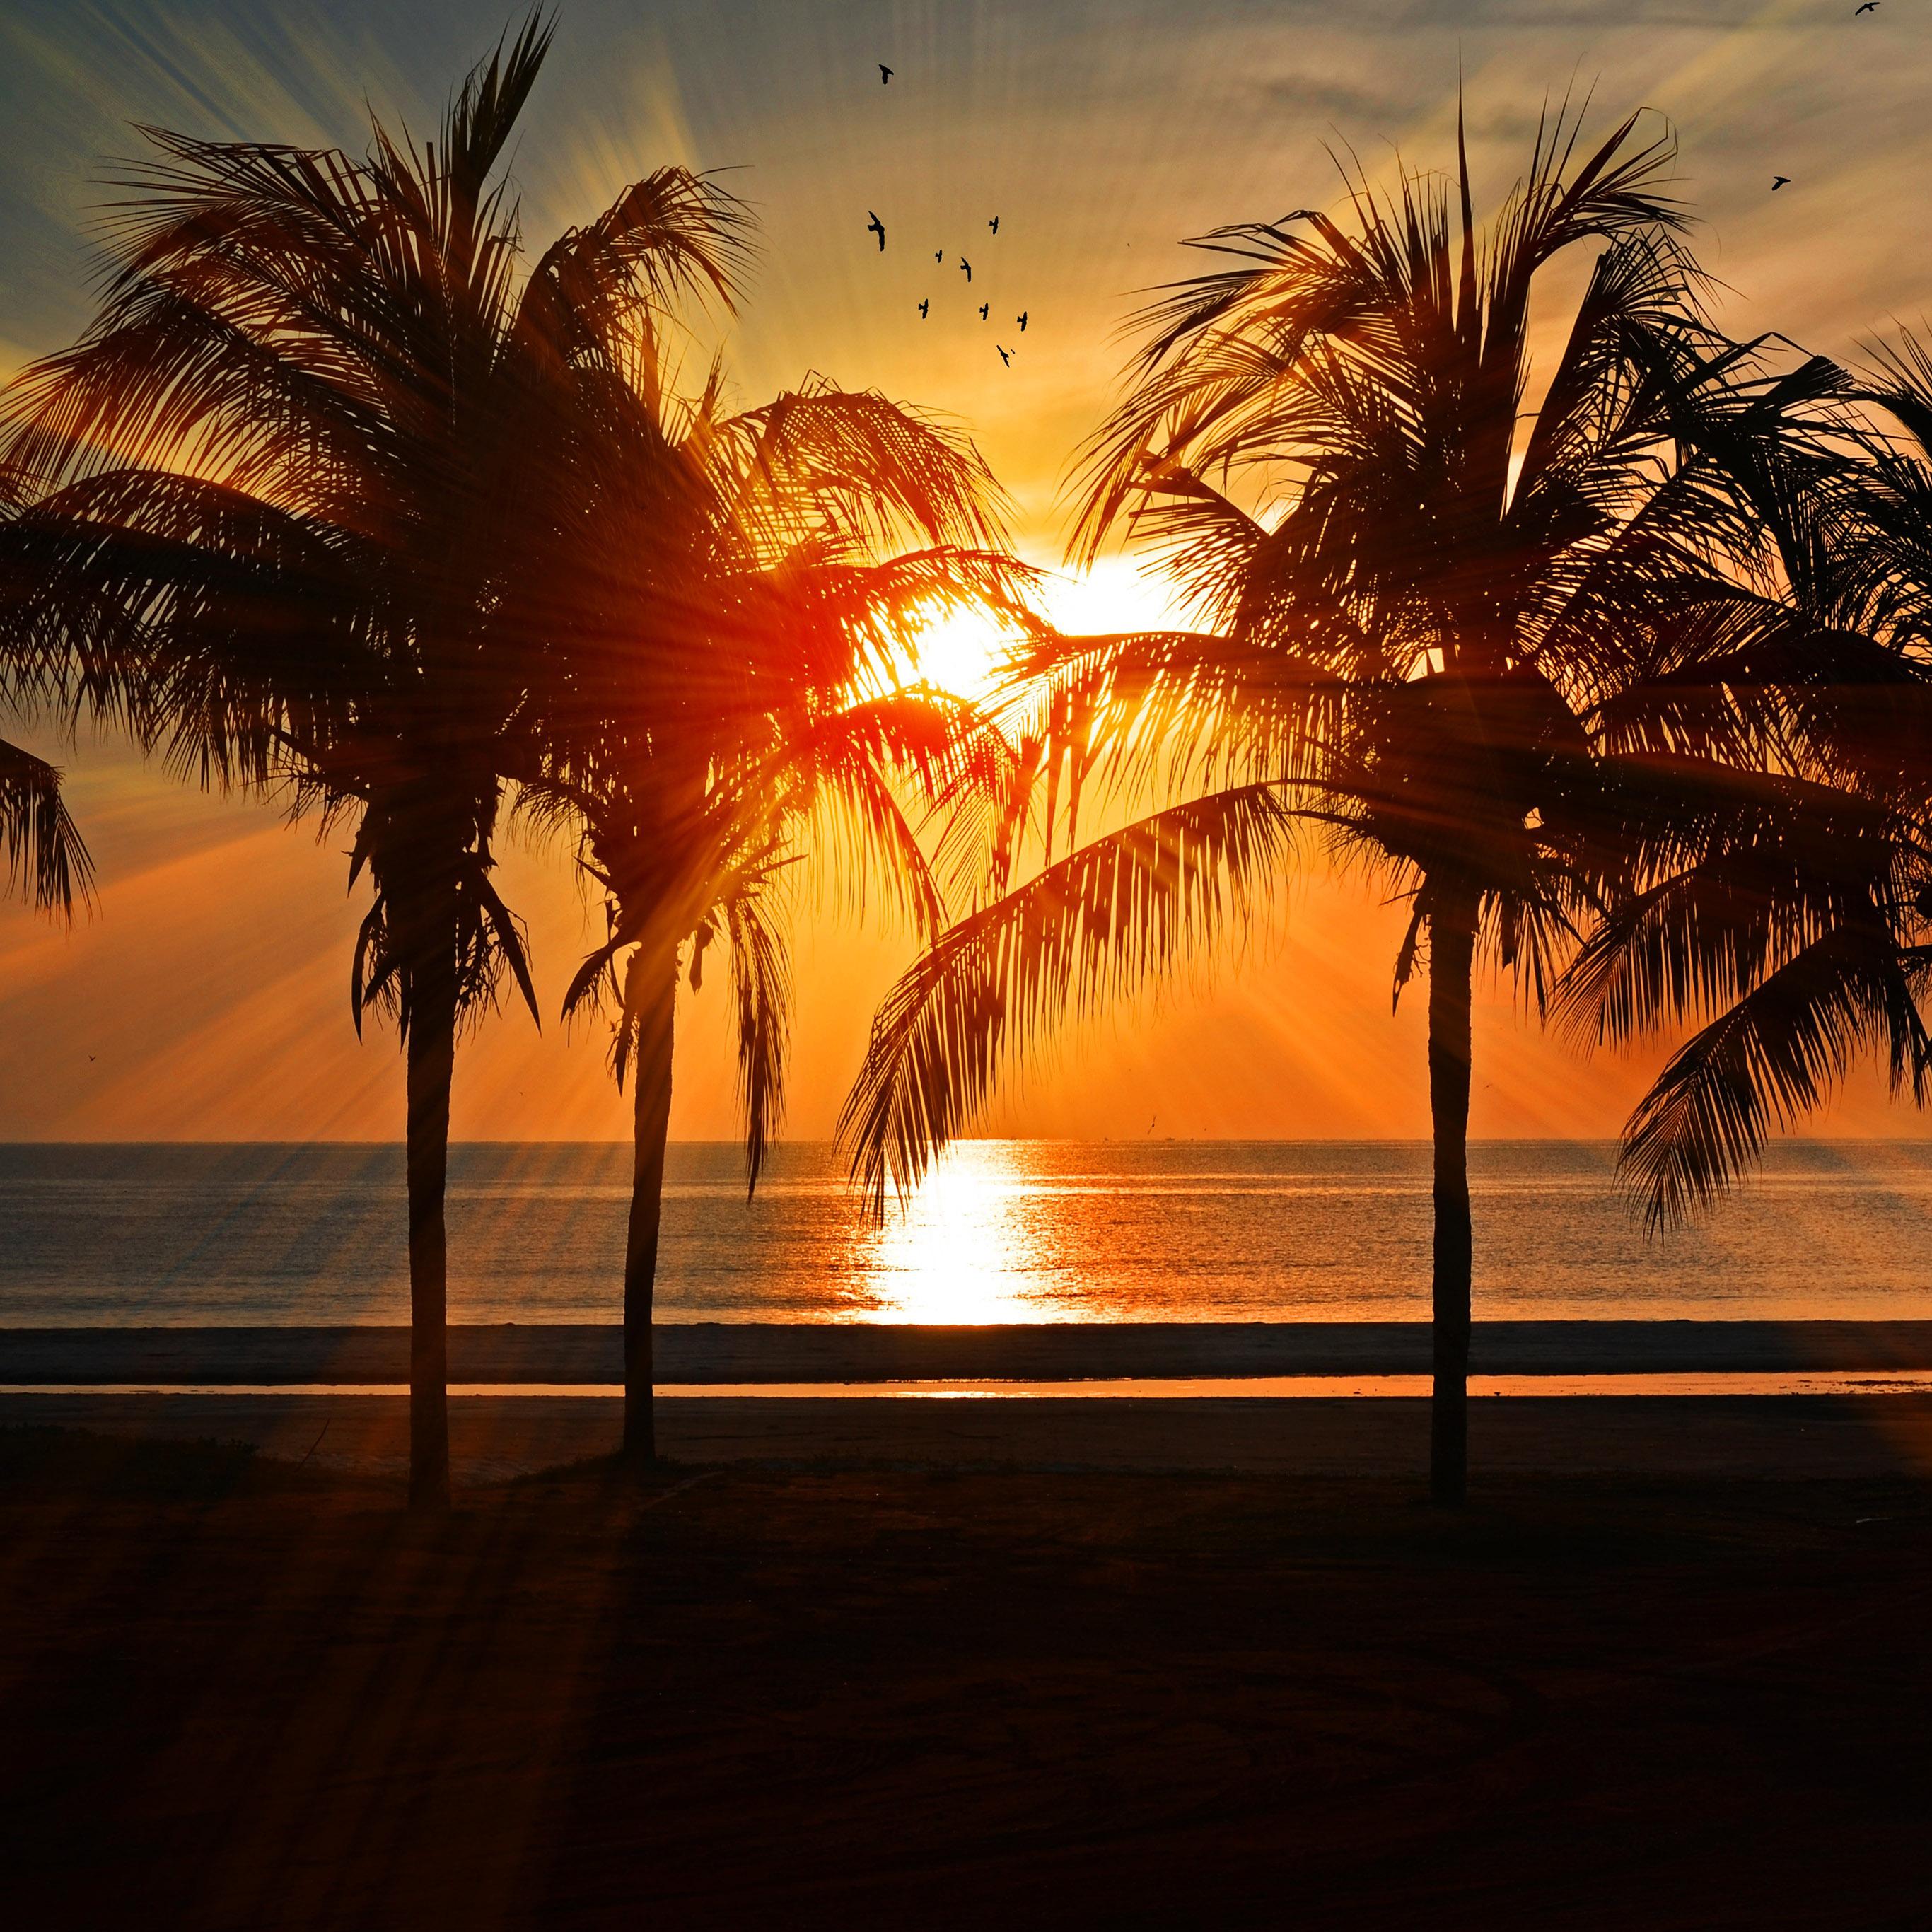 Nl74 Beach Vacation Summer Night Sunset Red Palm Tree Wallpaper